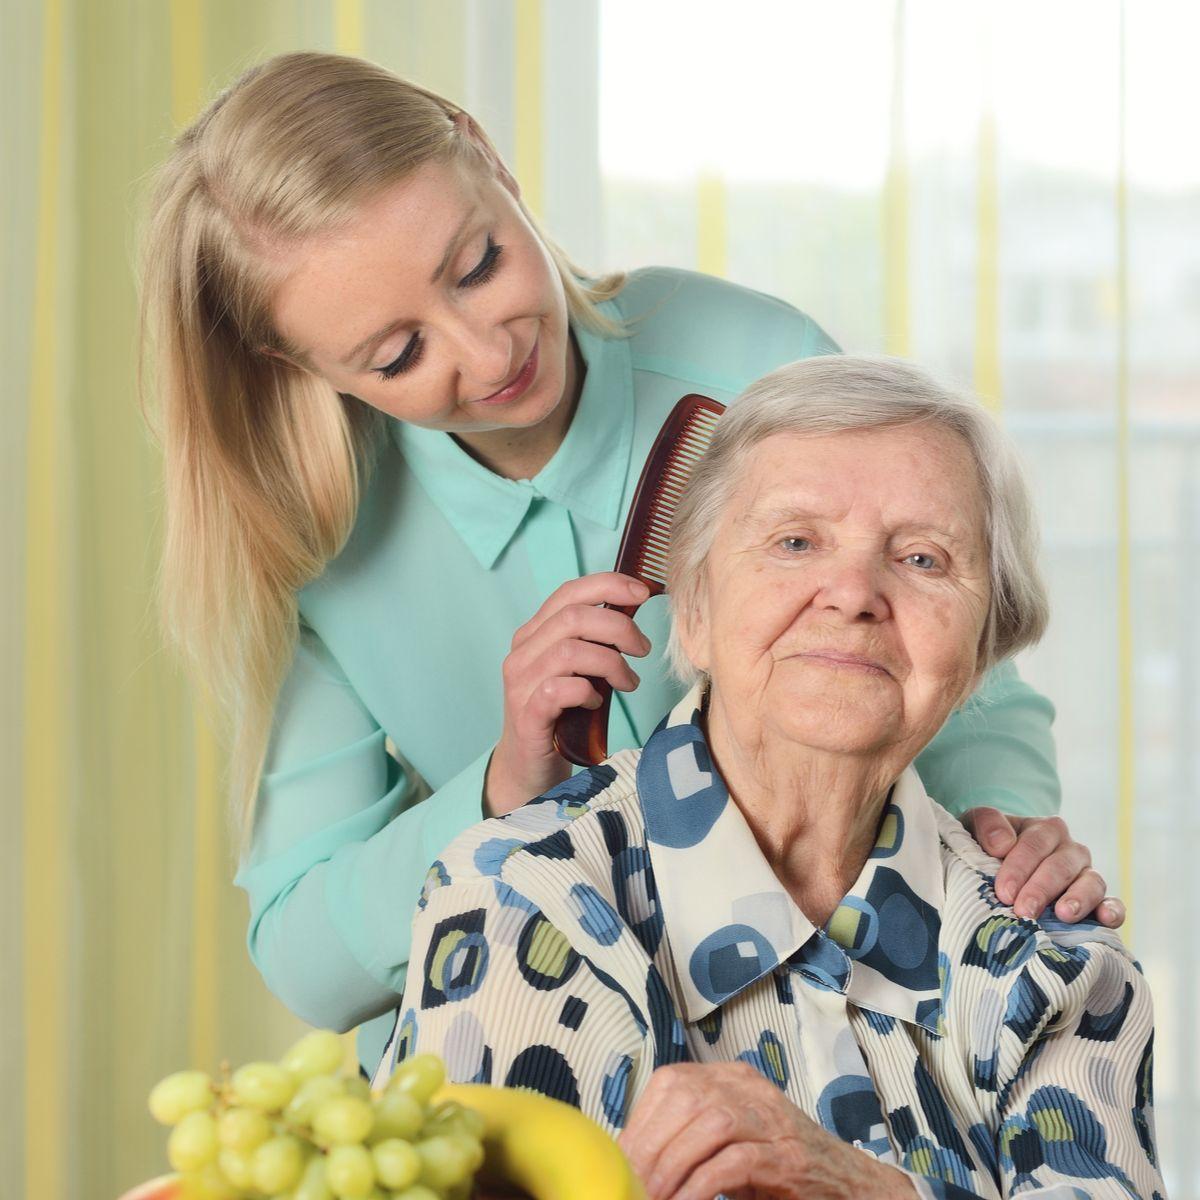 Pin on Alzheimer's Disease/Dementia